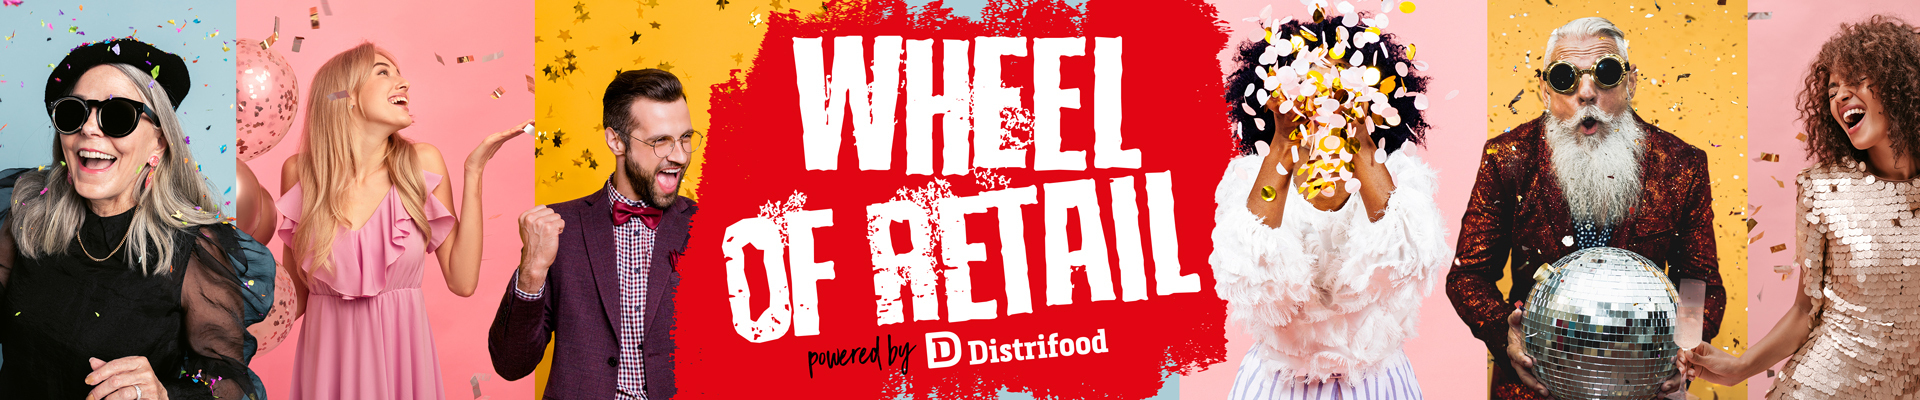 Wheel of Retail